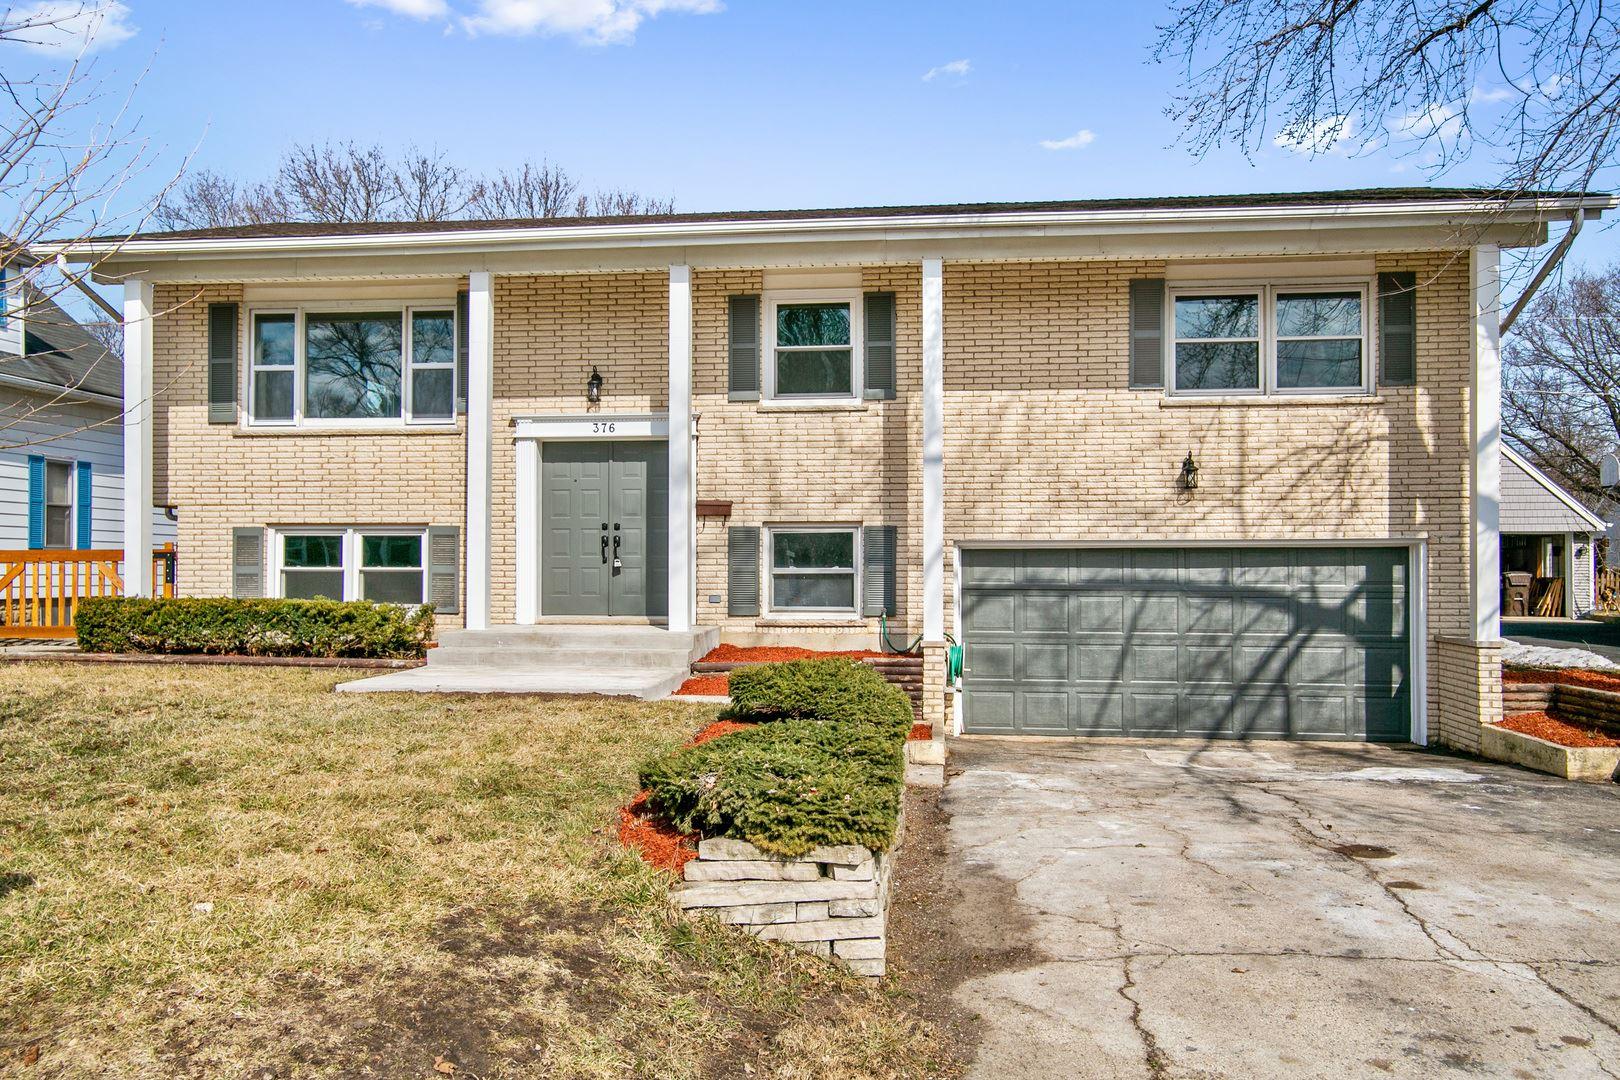 376 Hilkert Court, Crystal Lake, IL 60014 - #: 10994447